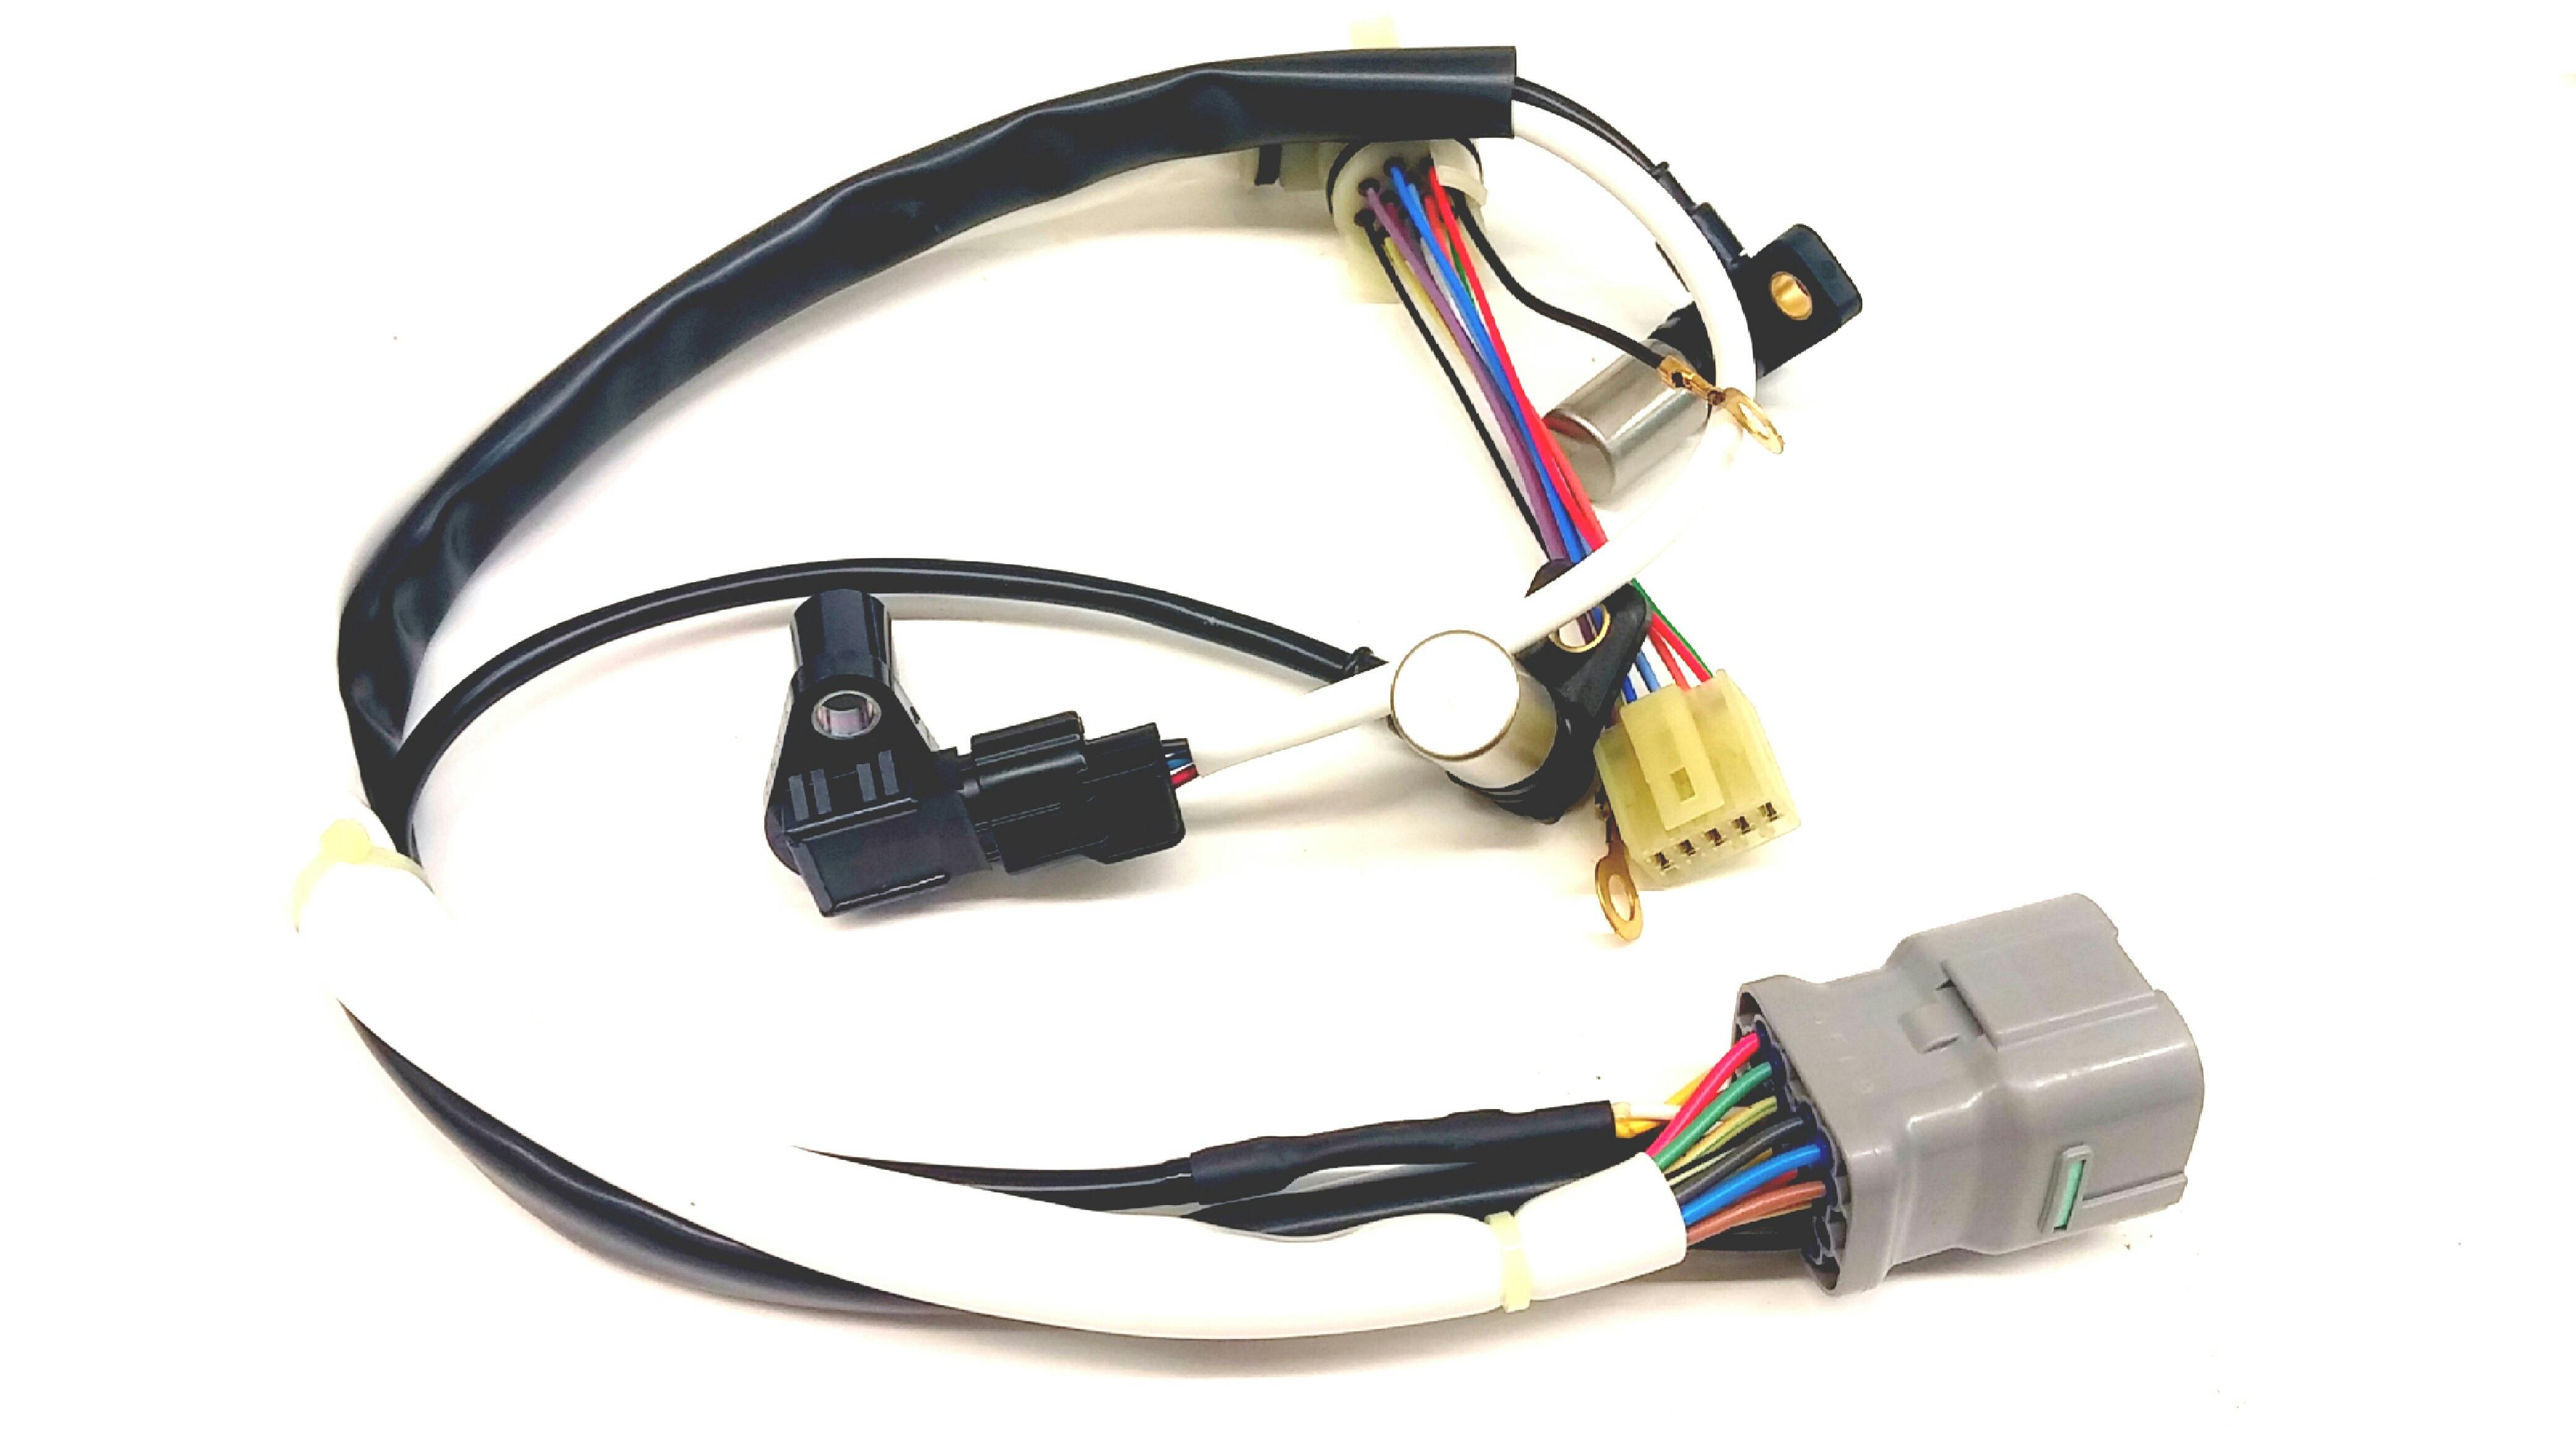 2009 subaru impreza sensor and harness assembly. Black Bedroom Furniture Sets. Home Design Ideas